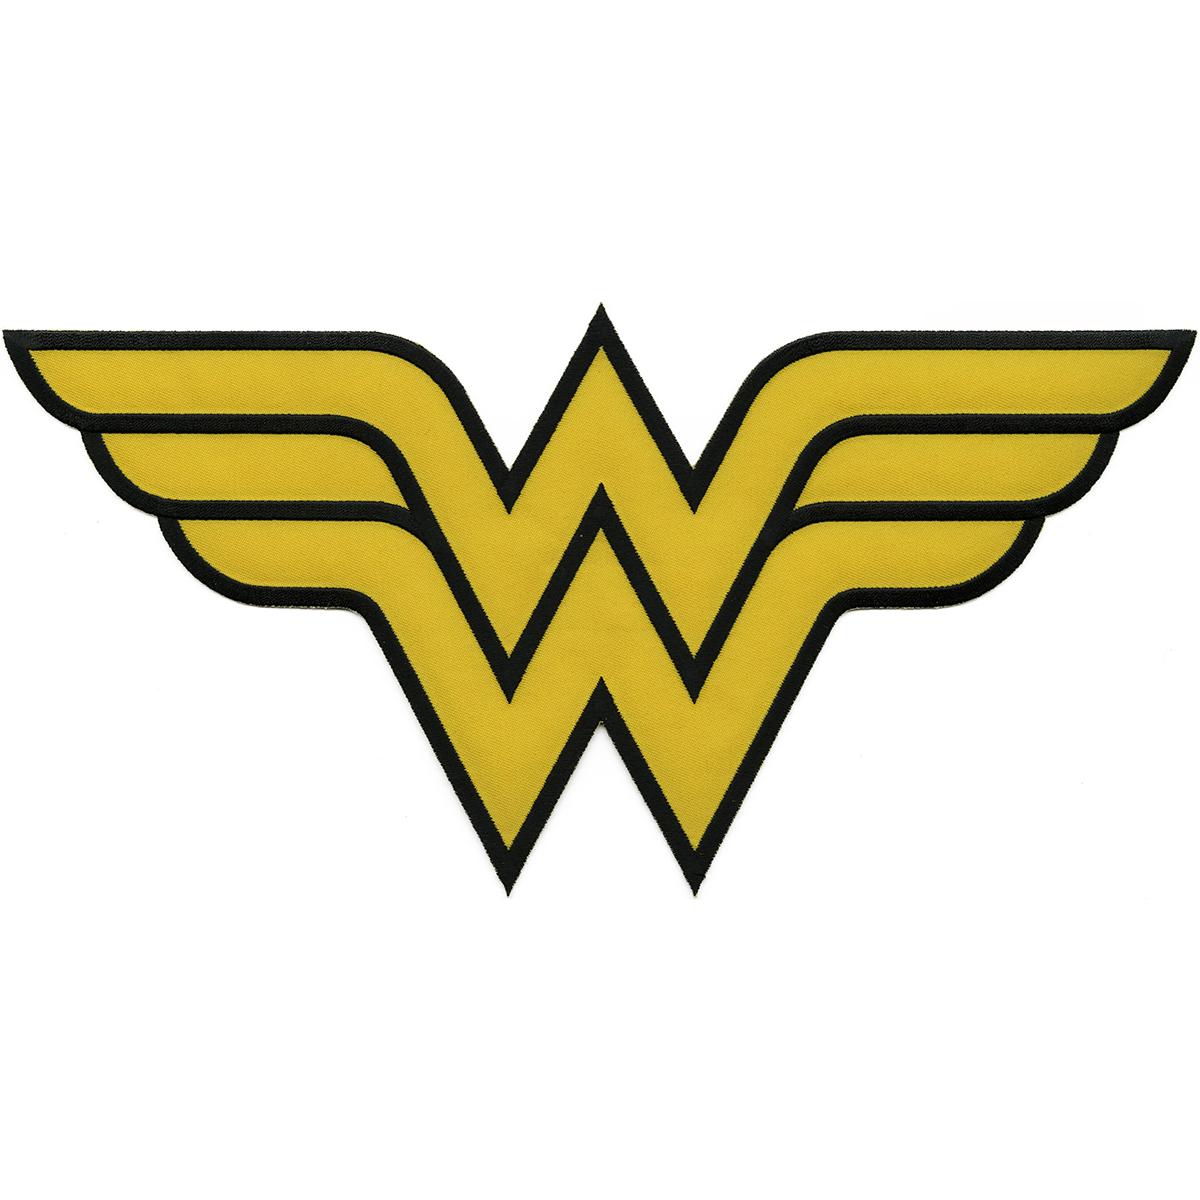 Dc comics patch wonder woman insignia 12x6 joann dc comics wonder woman insignia patch biocorpaavc Images